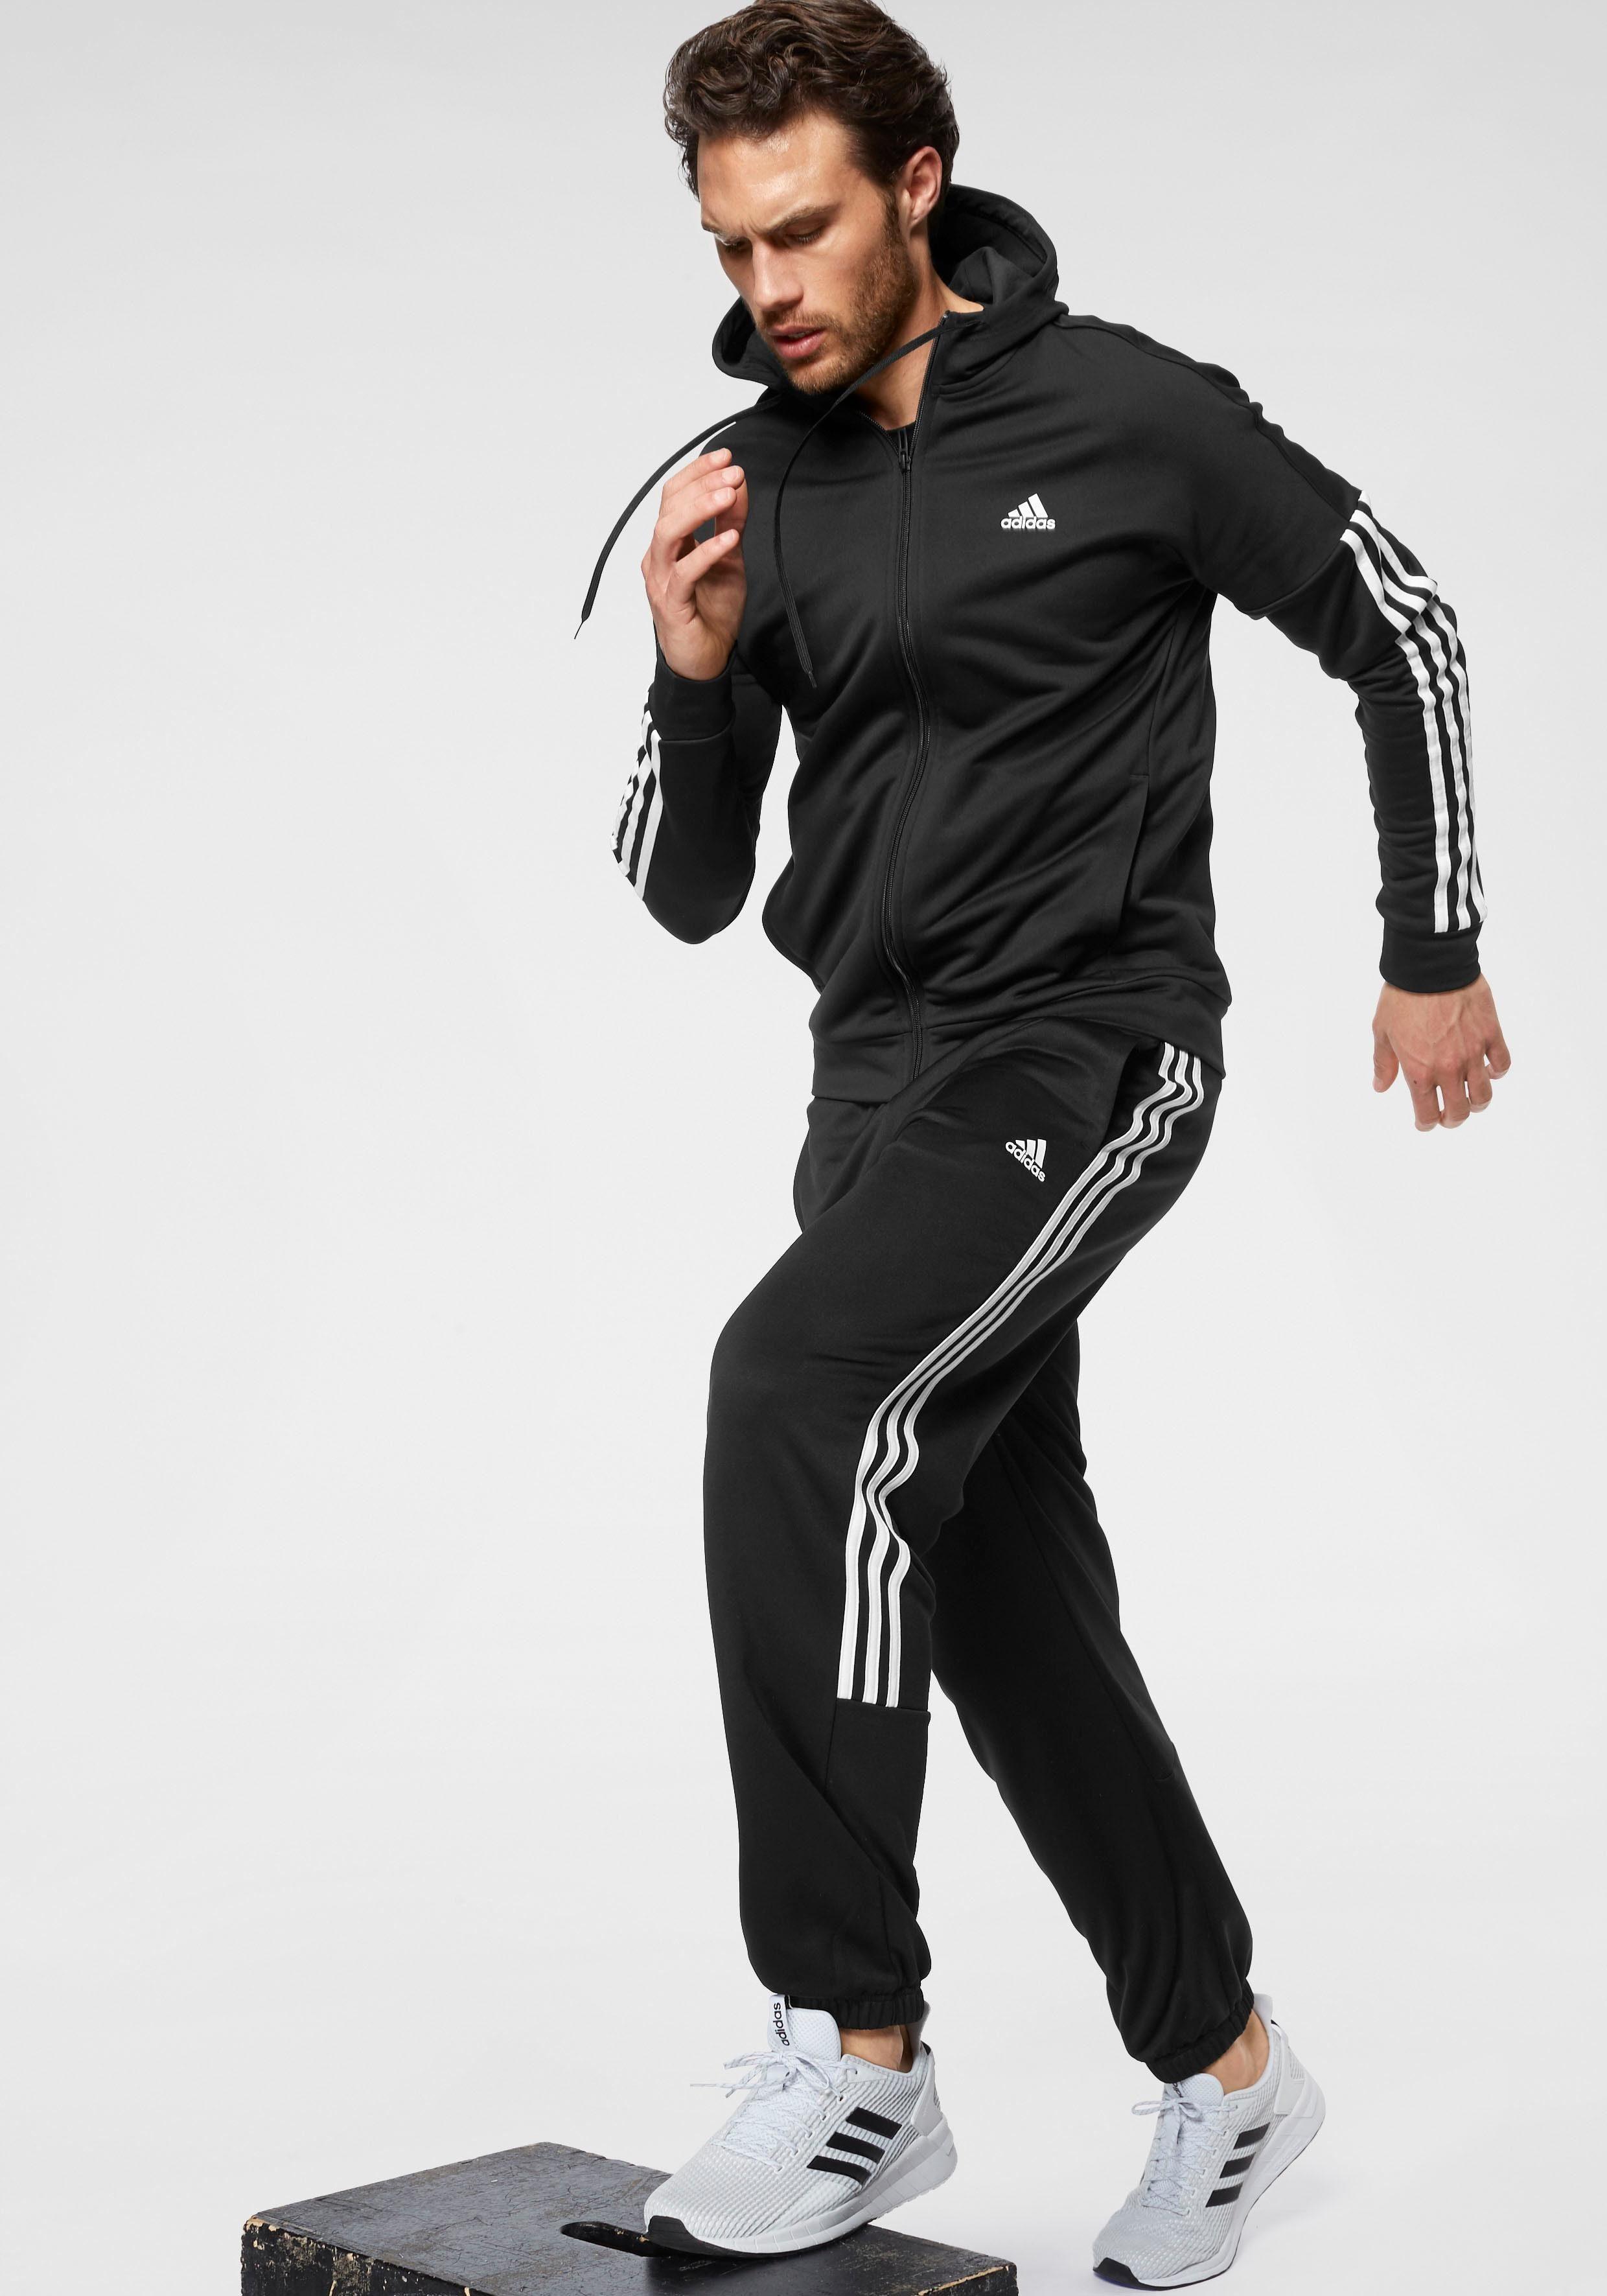 adidas Performance Trainingsanzug, Logodruck online kaufen   OTTO